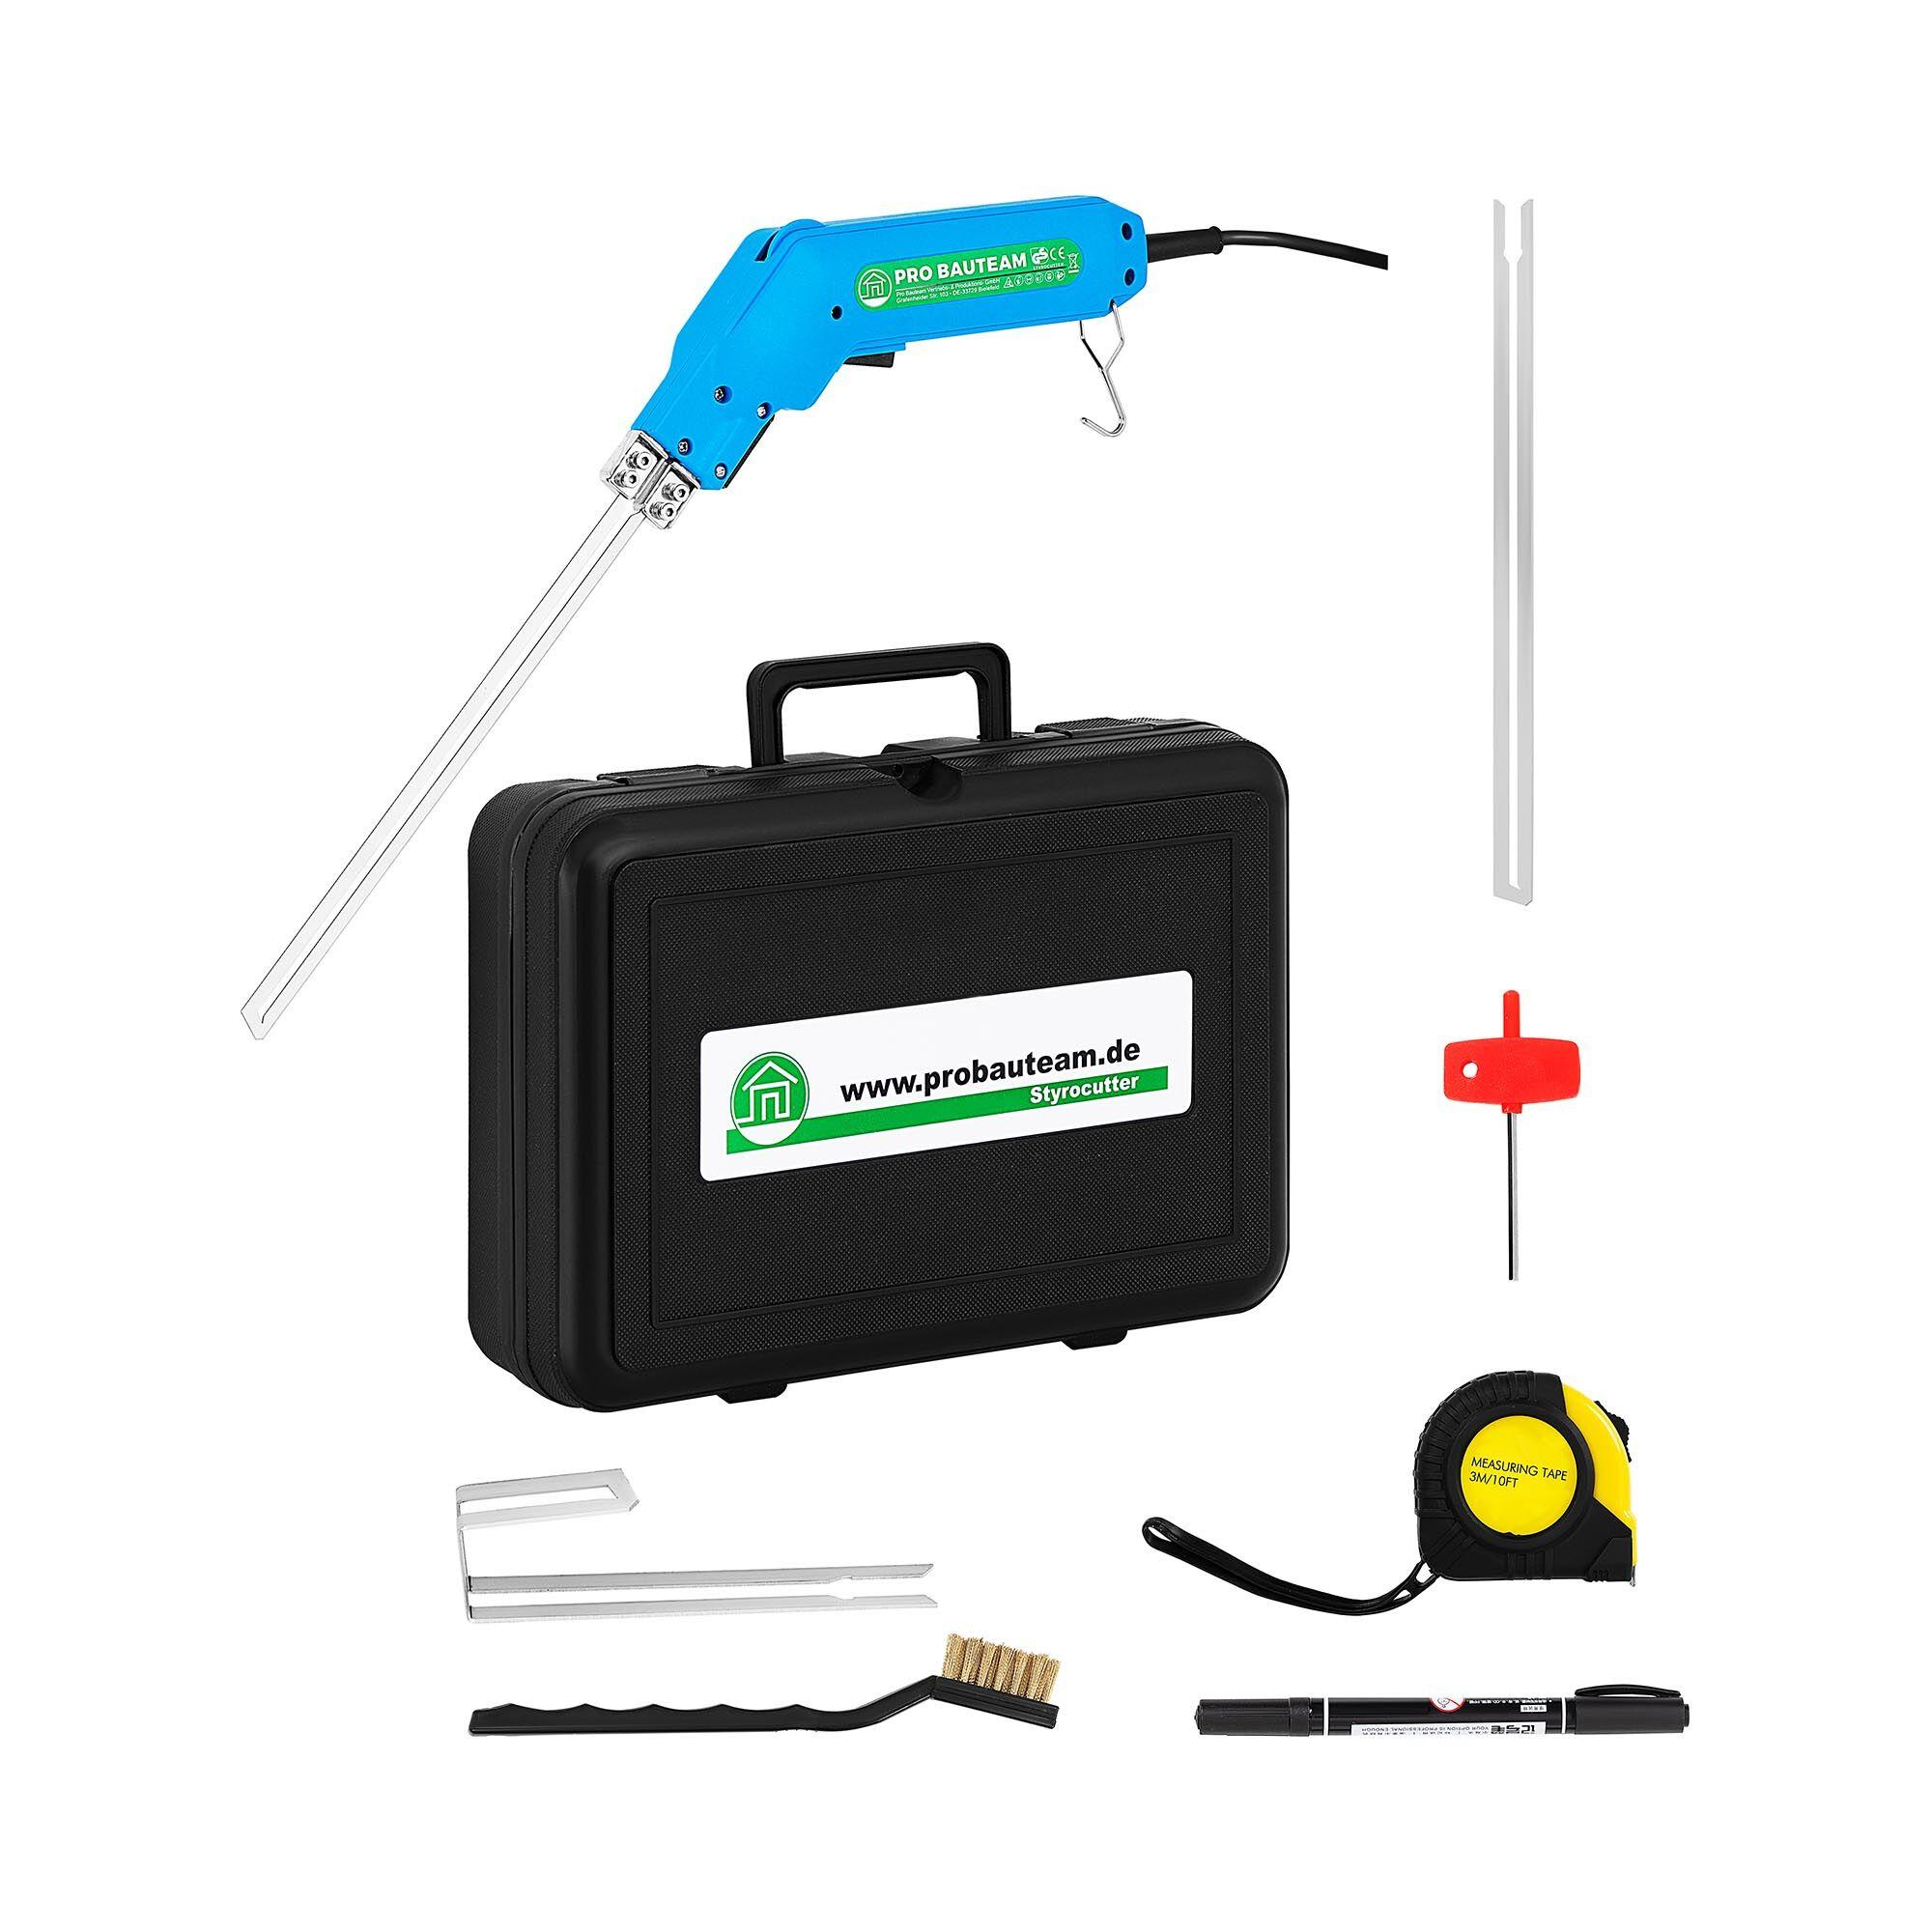 Pro Bauteam Cutter elettrico per polistirolo - 250 W STYRO CUTTER PBT02